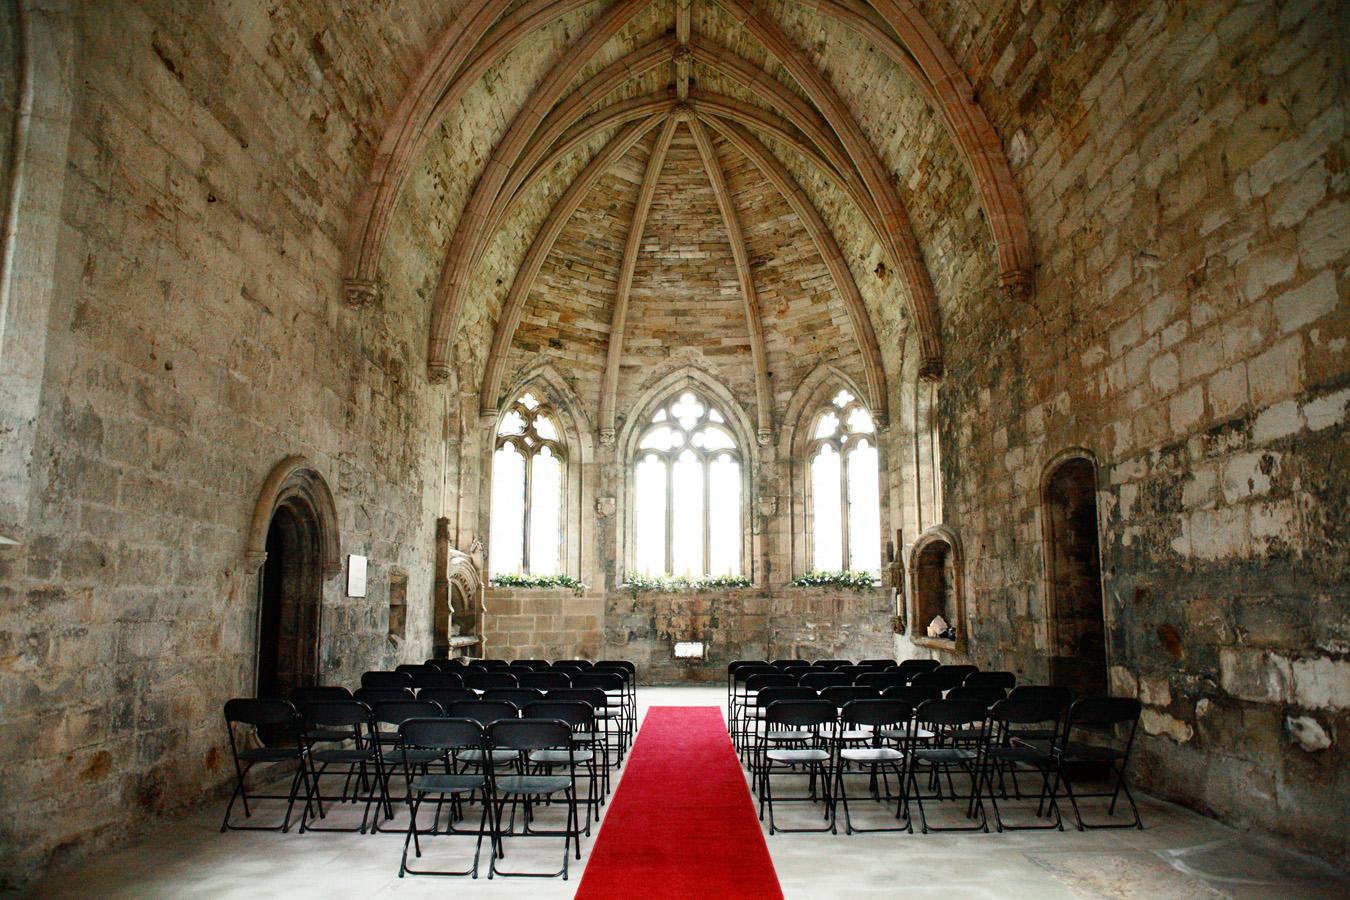 seton-collegiate-church-wedding-photos-2